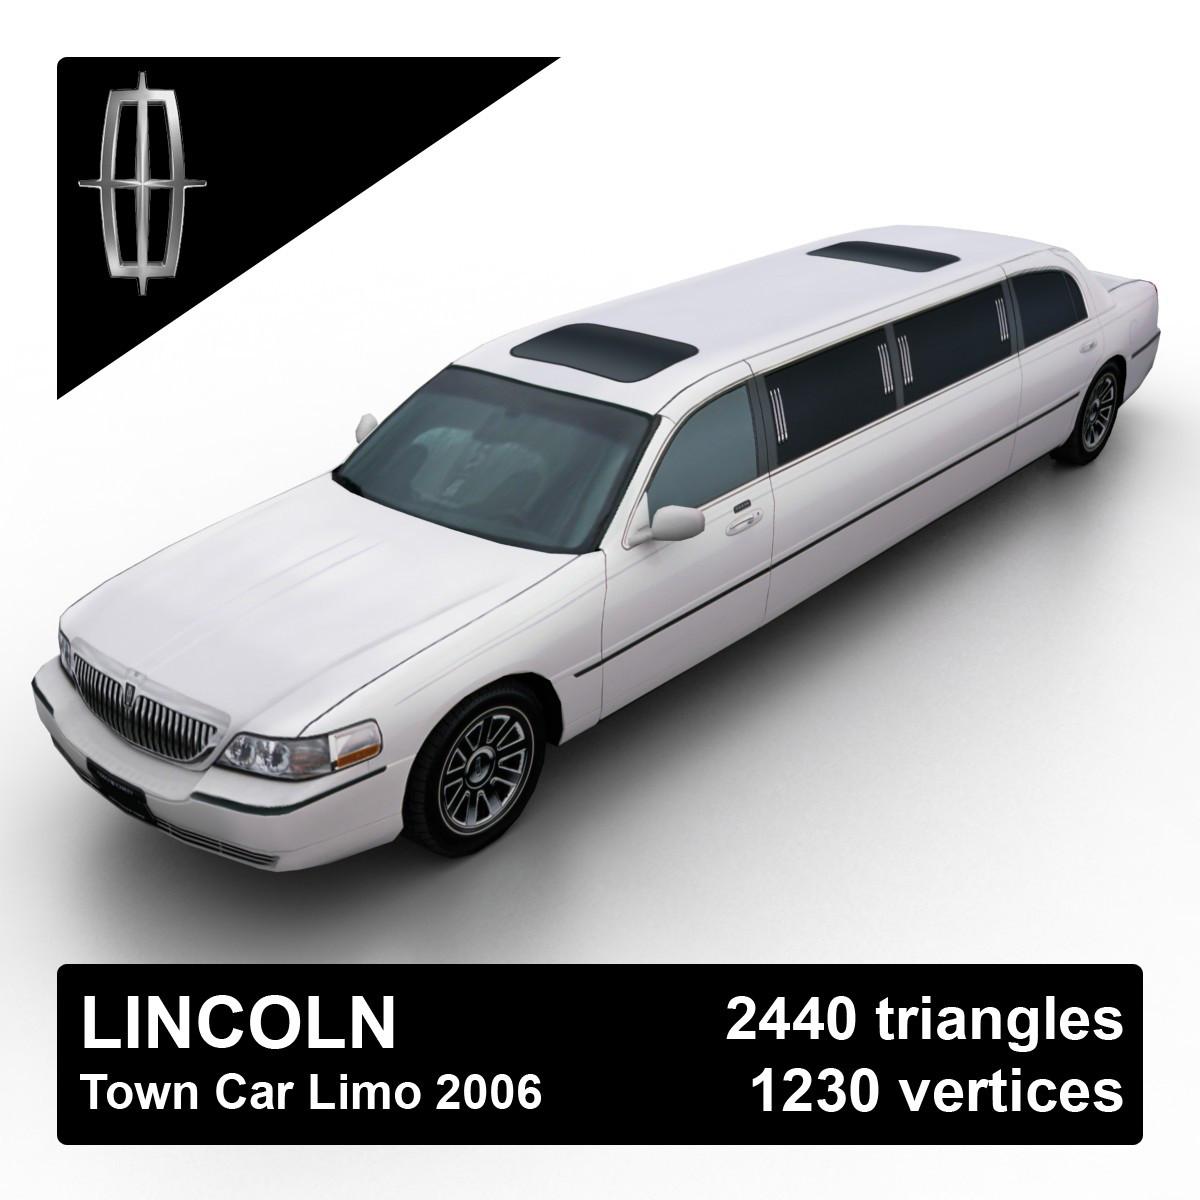 Lincoln_Town_Car_Limo_2006_0000.jpg